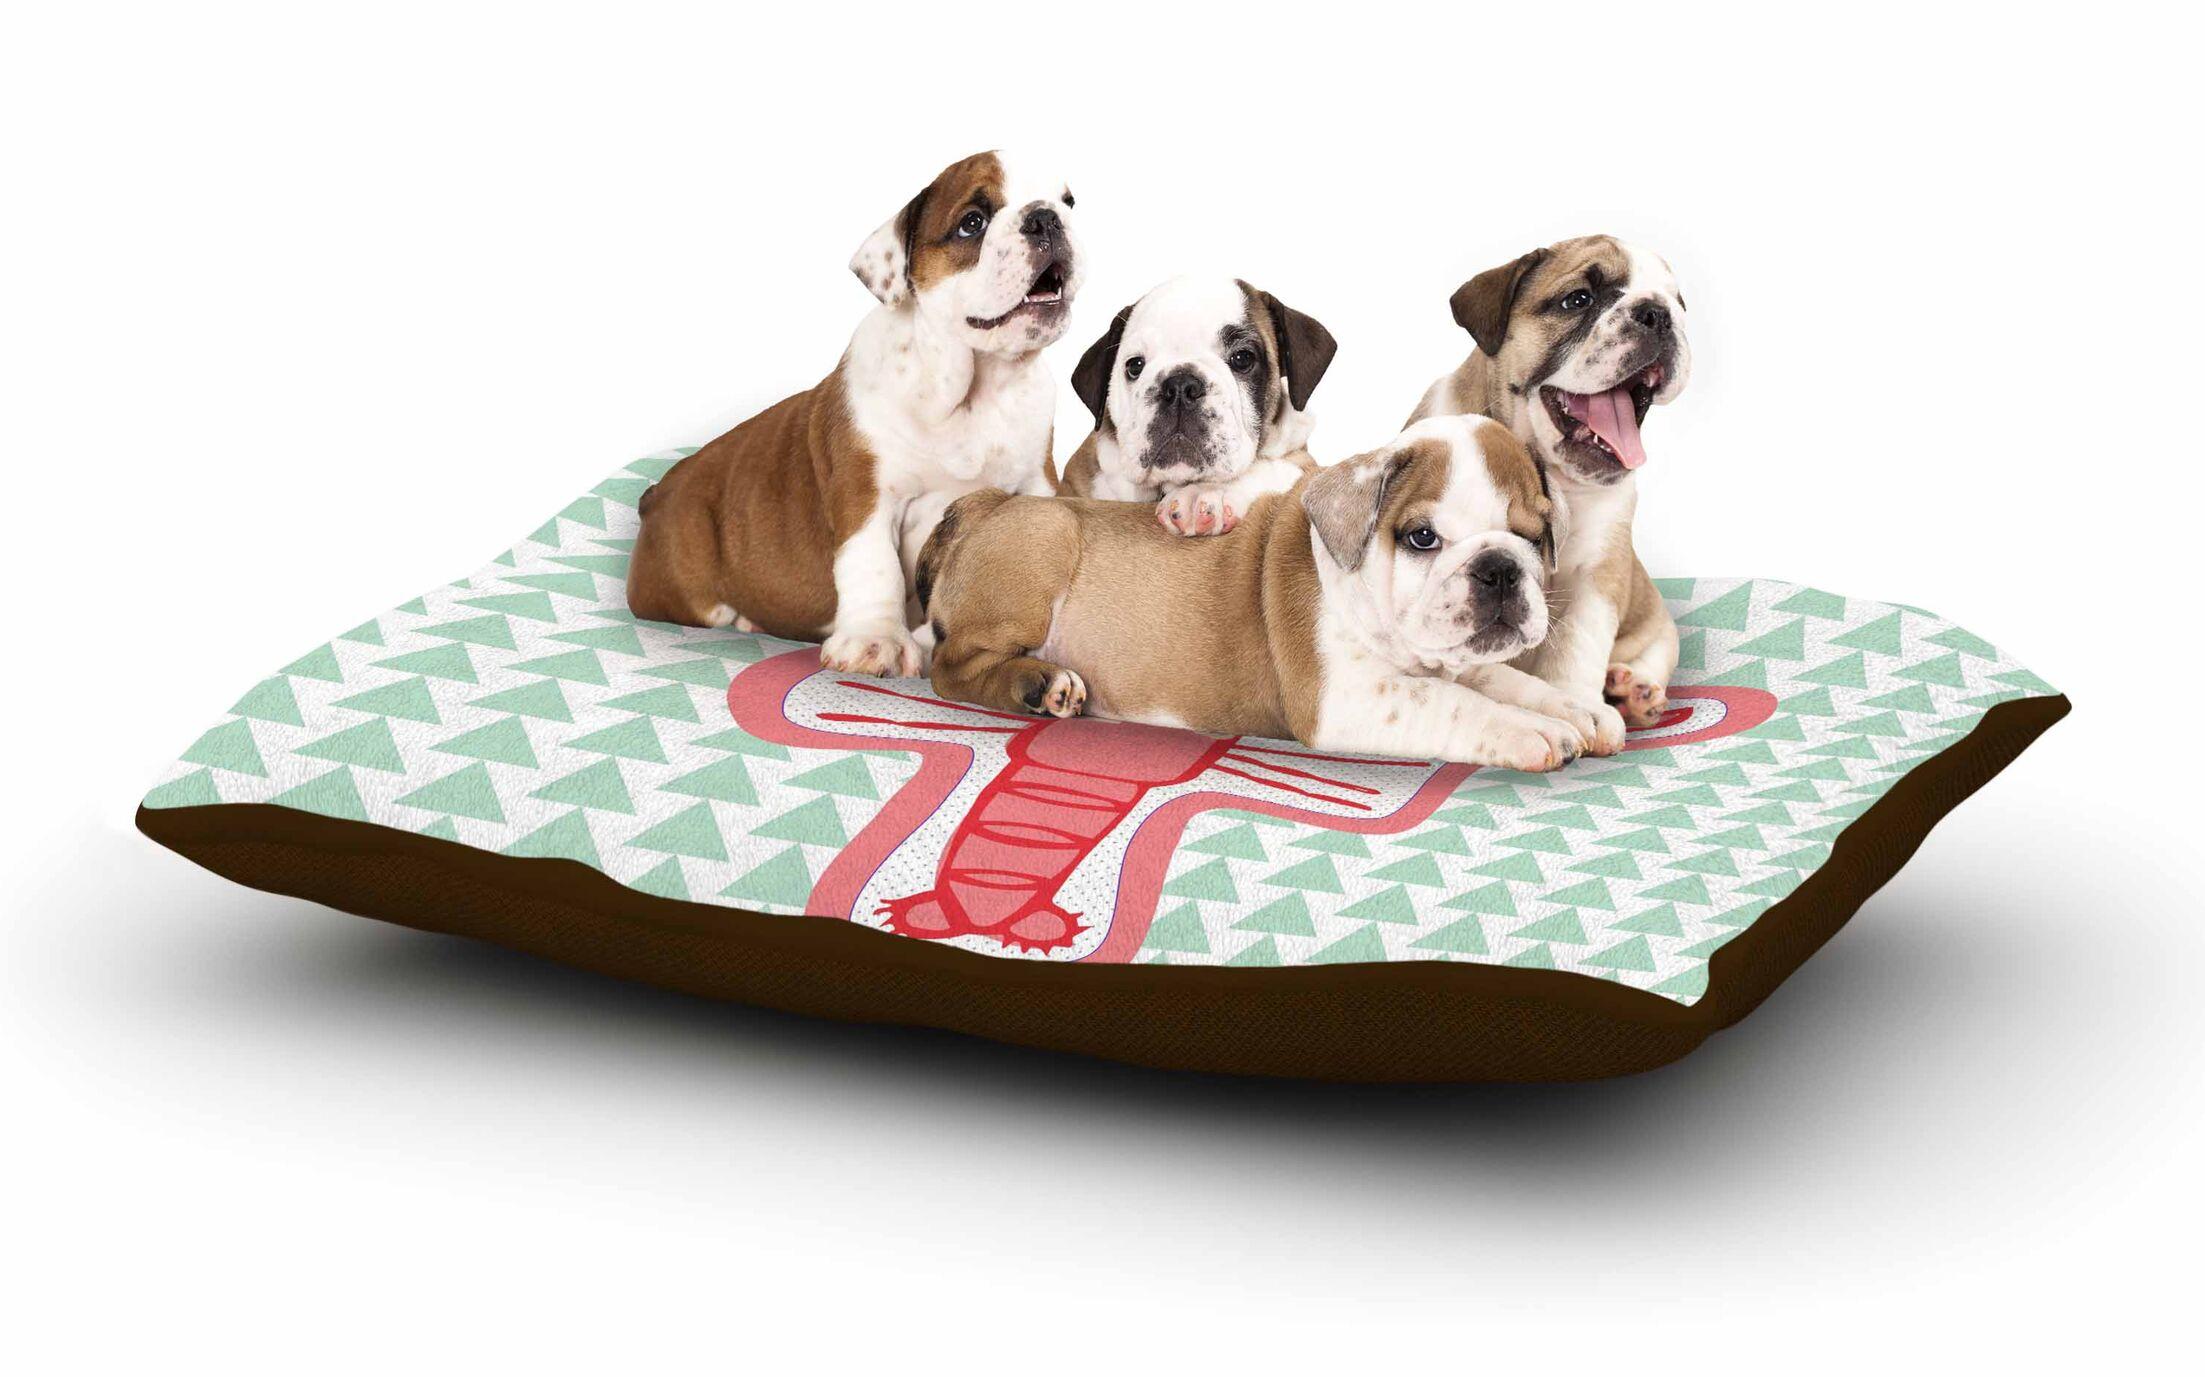 MaJoBV 'Langosta' Lobster Dog Pillow with Fleece Cozy Top